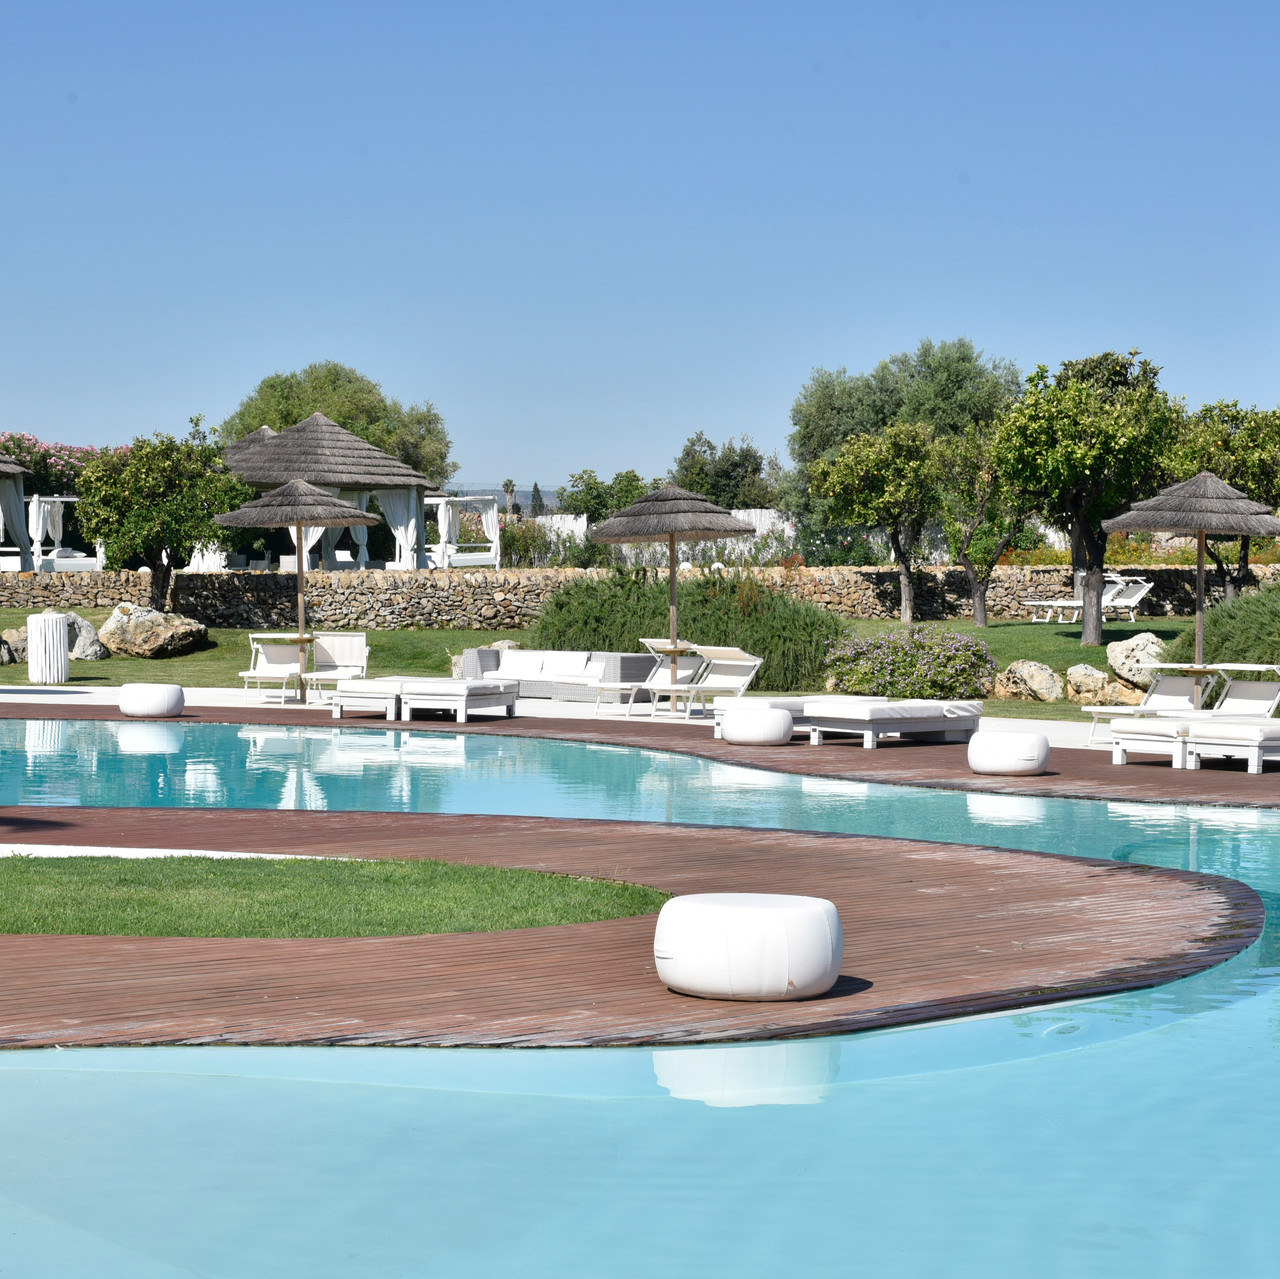 Imagesdesaveurs - Borgo Pantano piscina